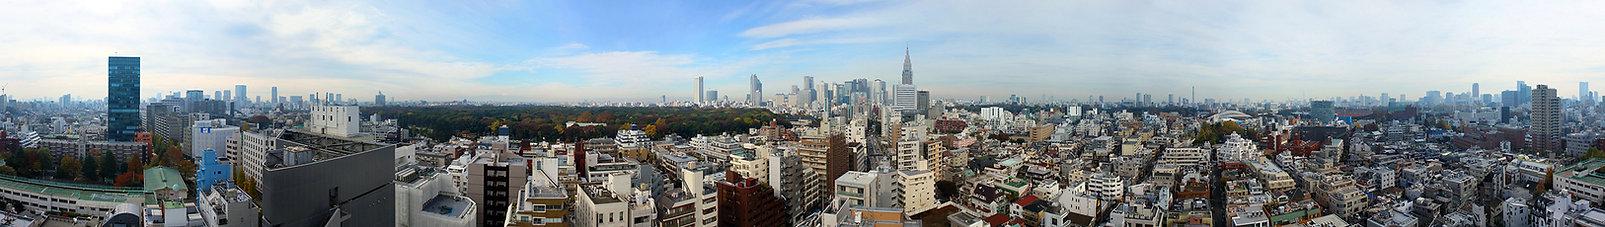 30F-Panorama.jpg